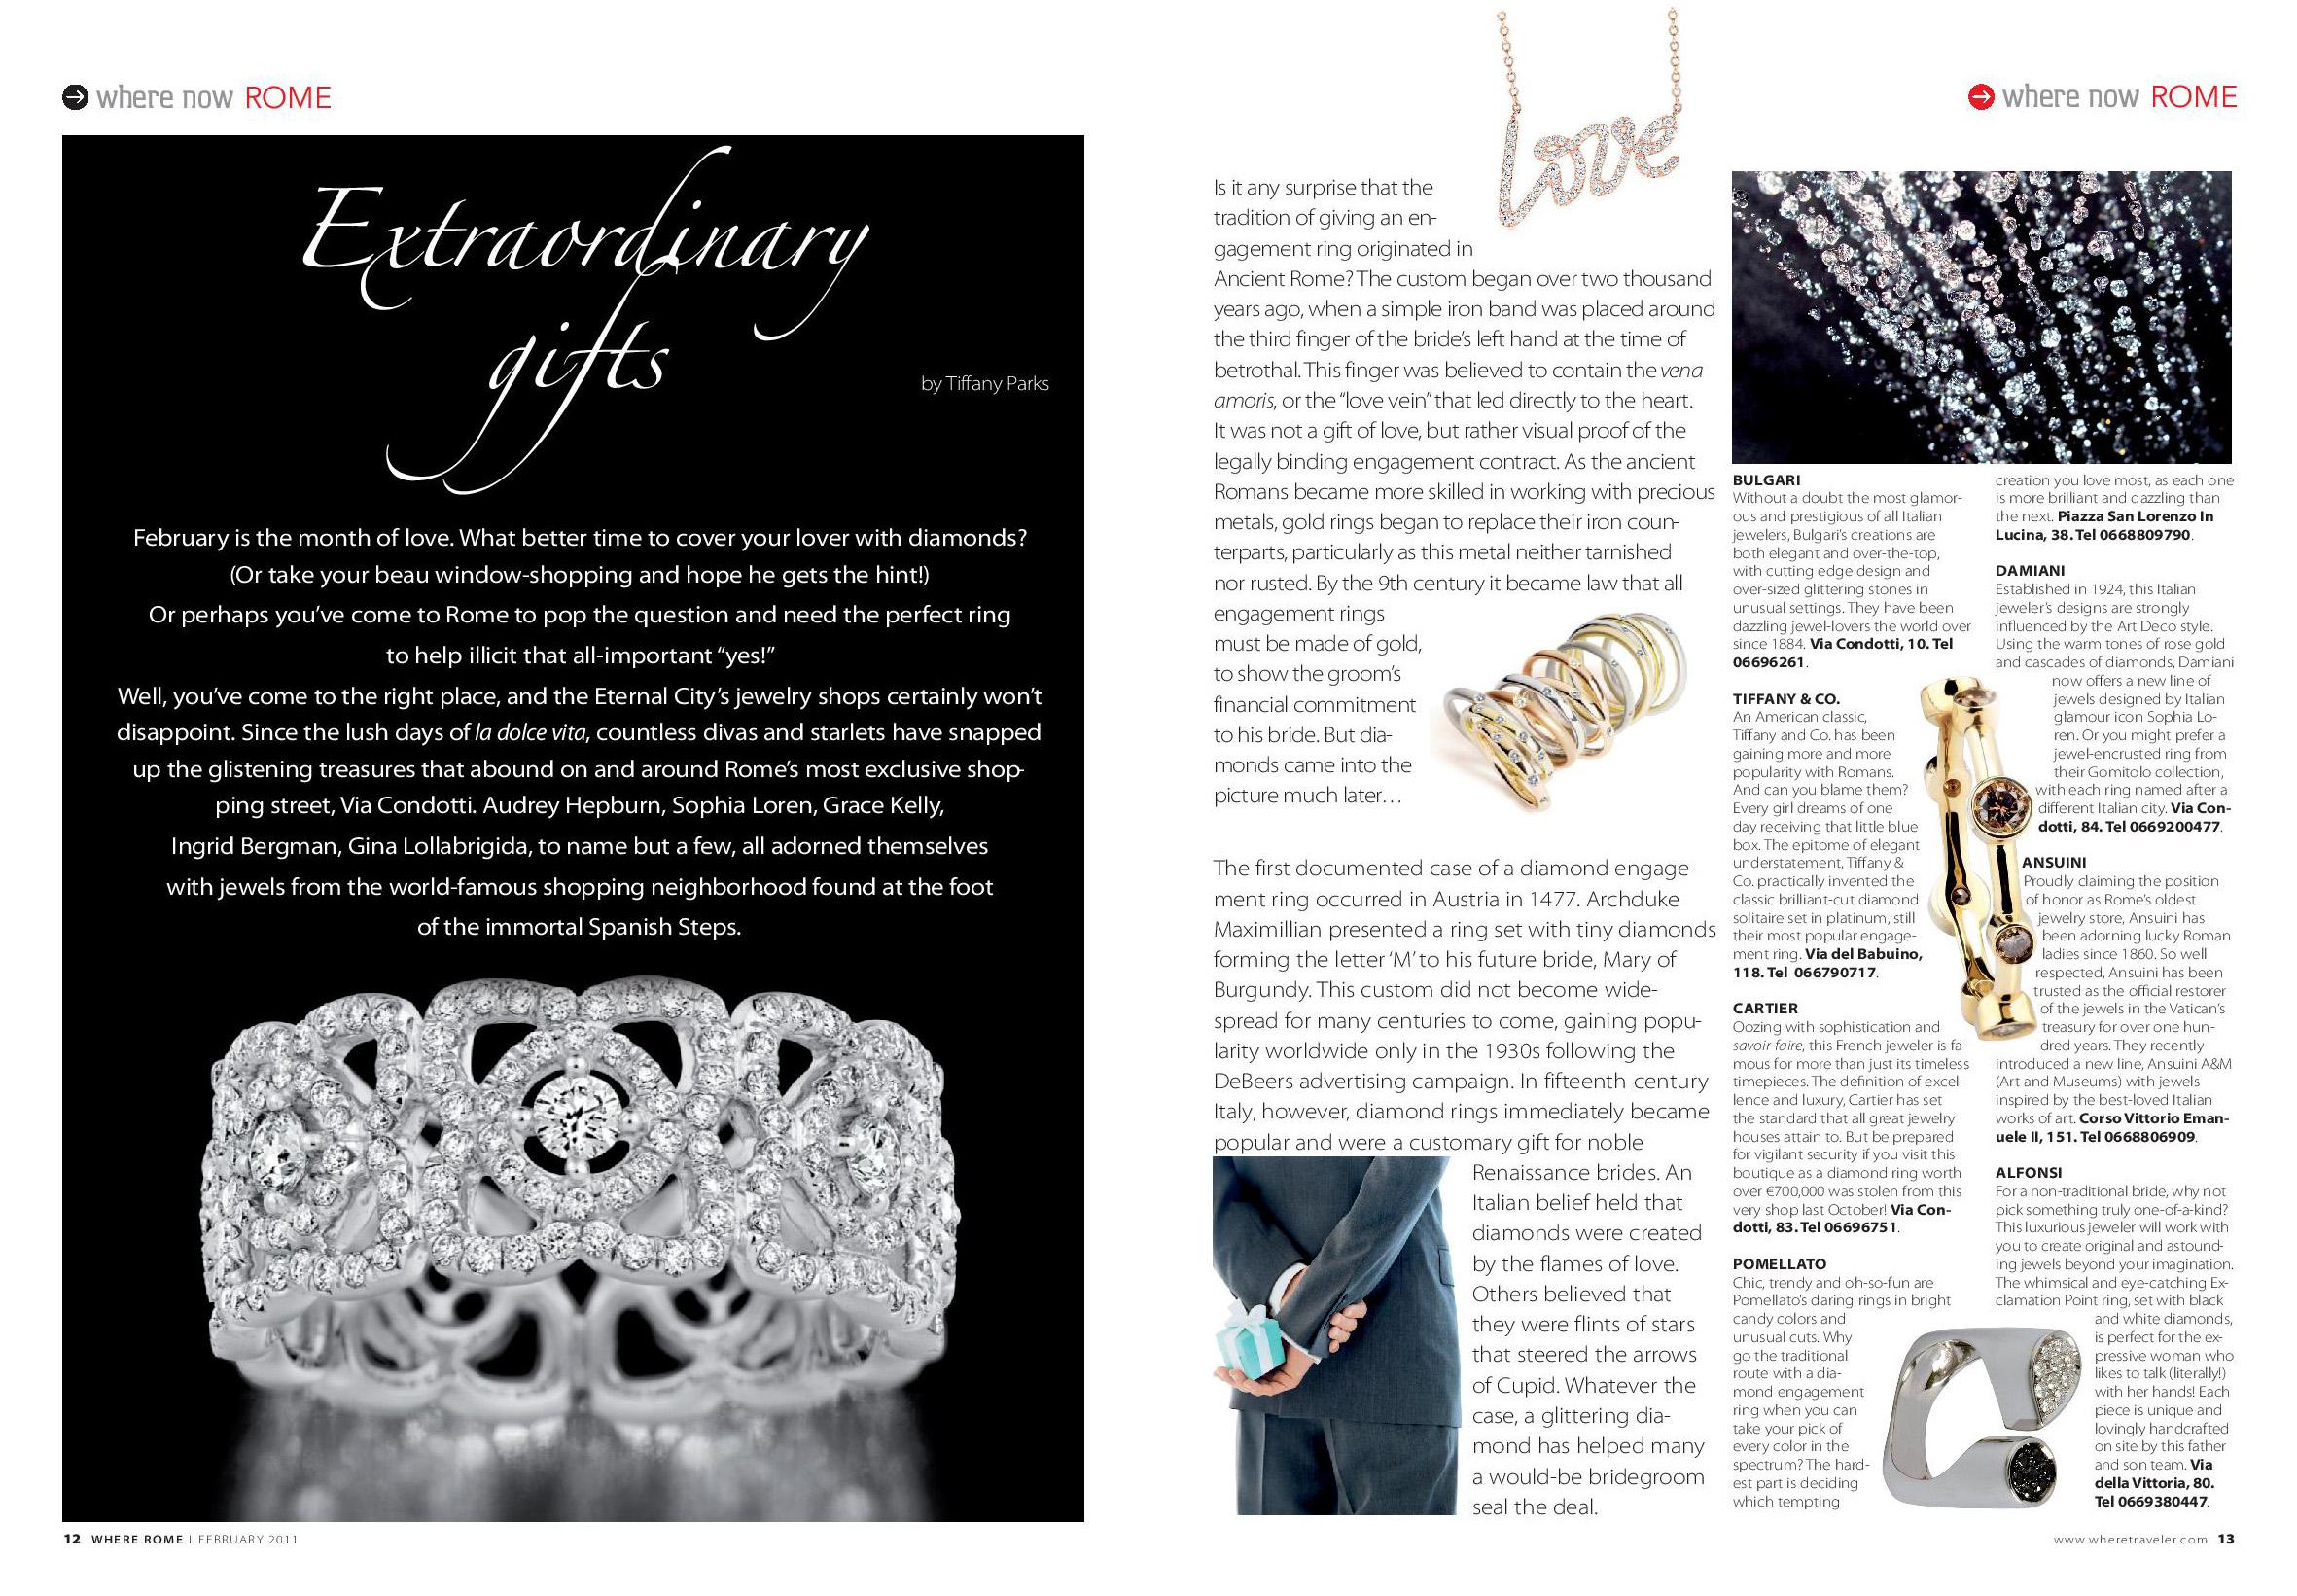 Extraordinary-gifts-where-rome-feb-2011.jpg